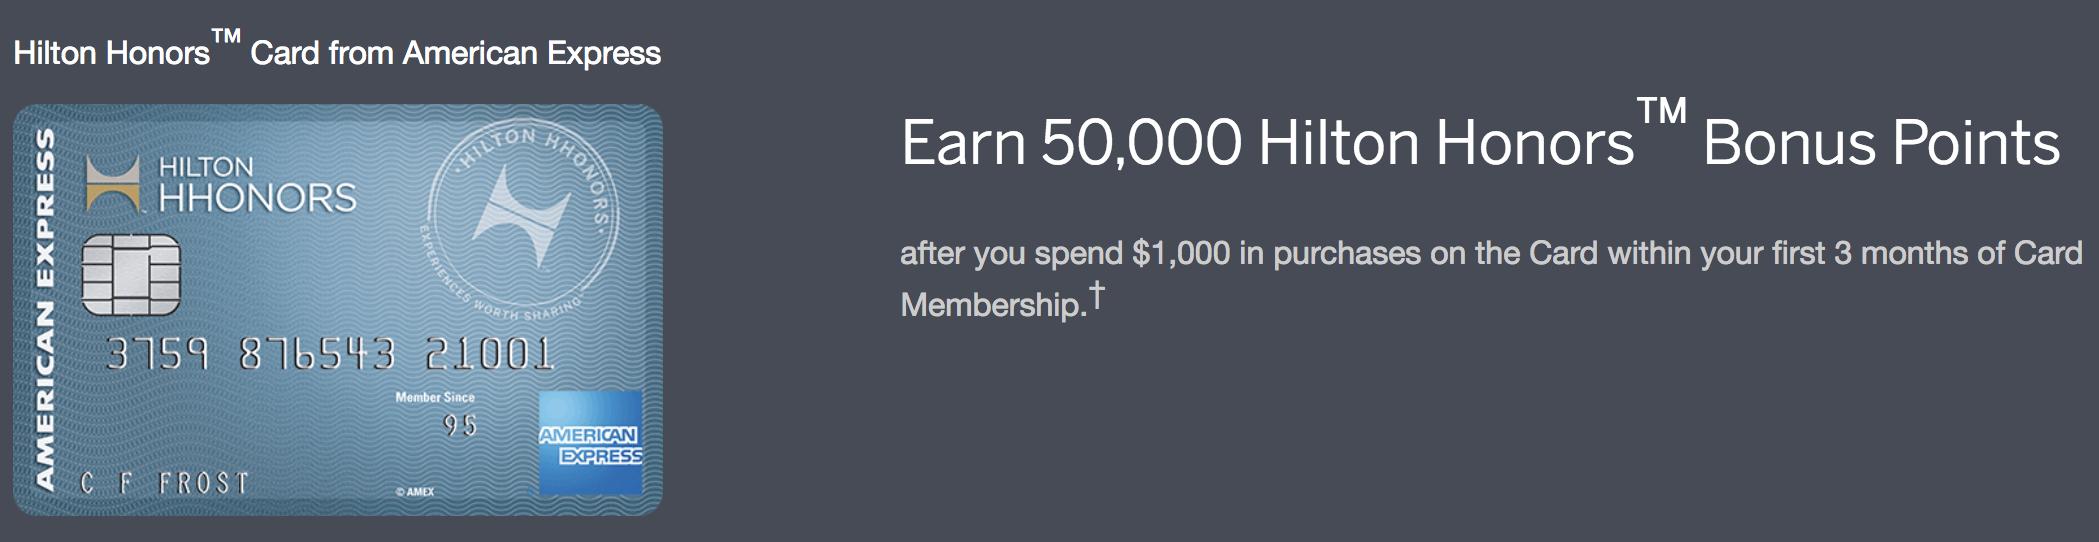 American Express Hilton Honors™ Rewards Credit Card Review